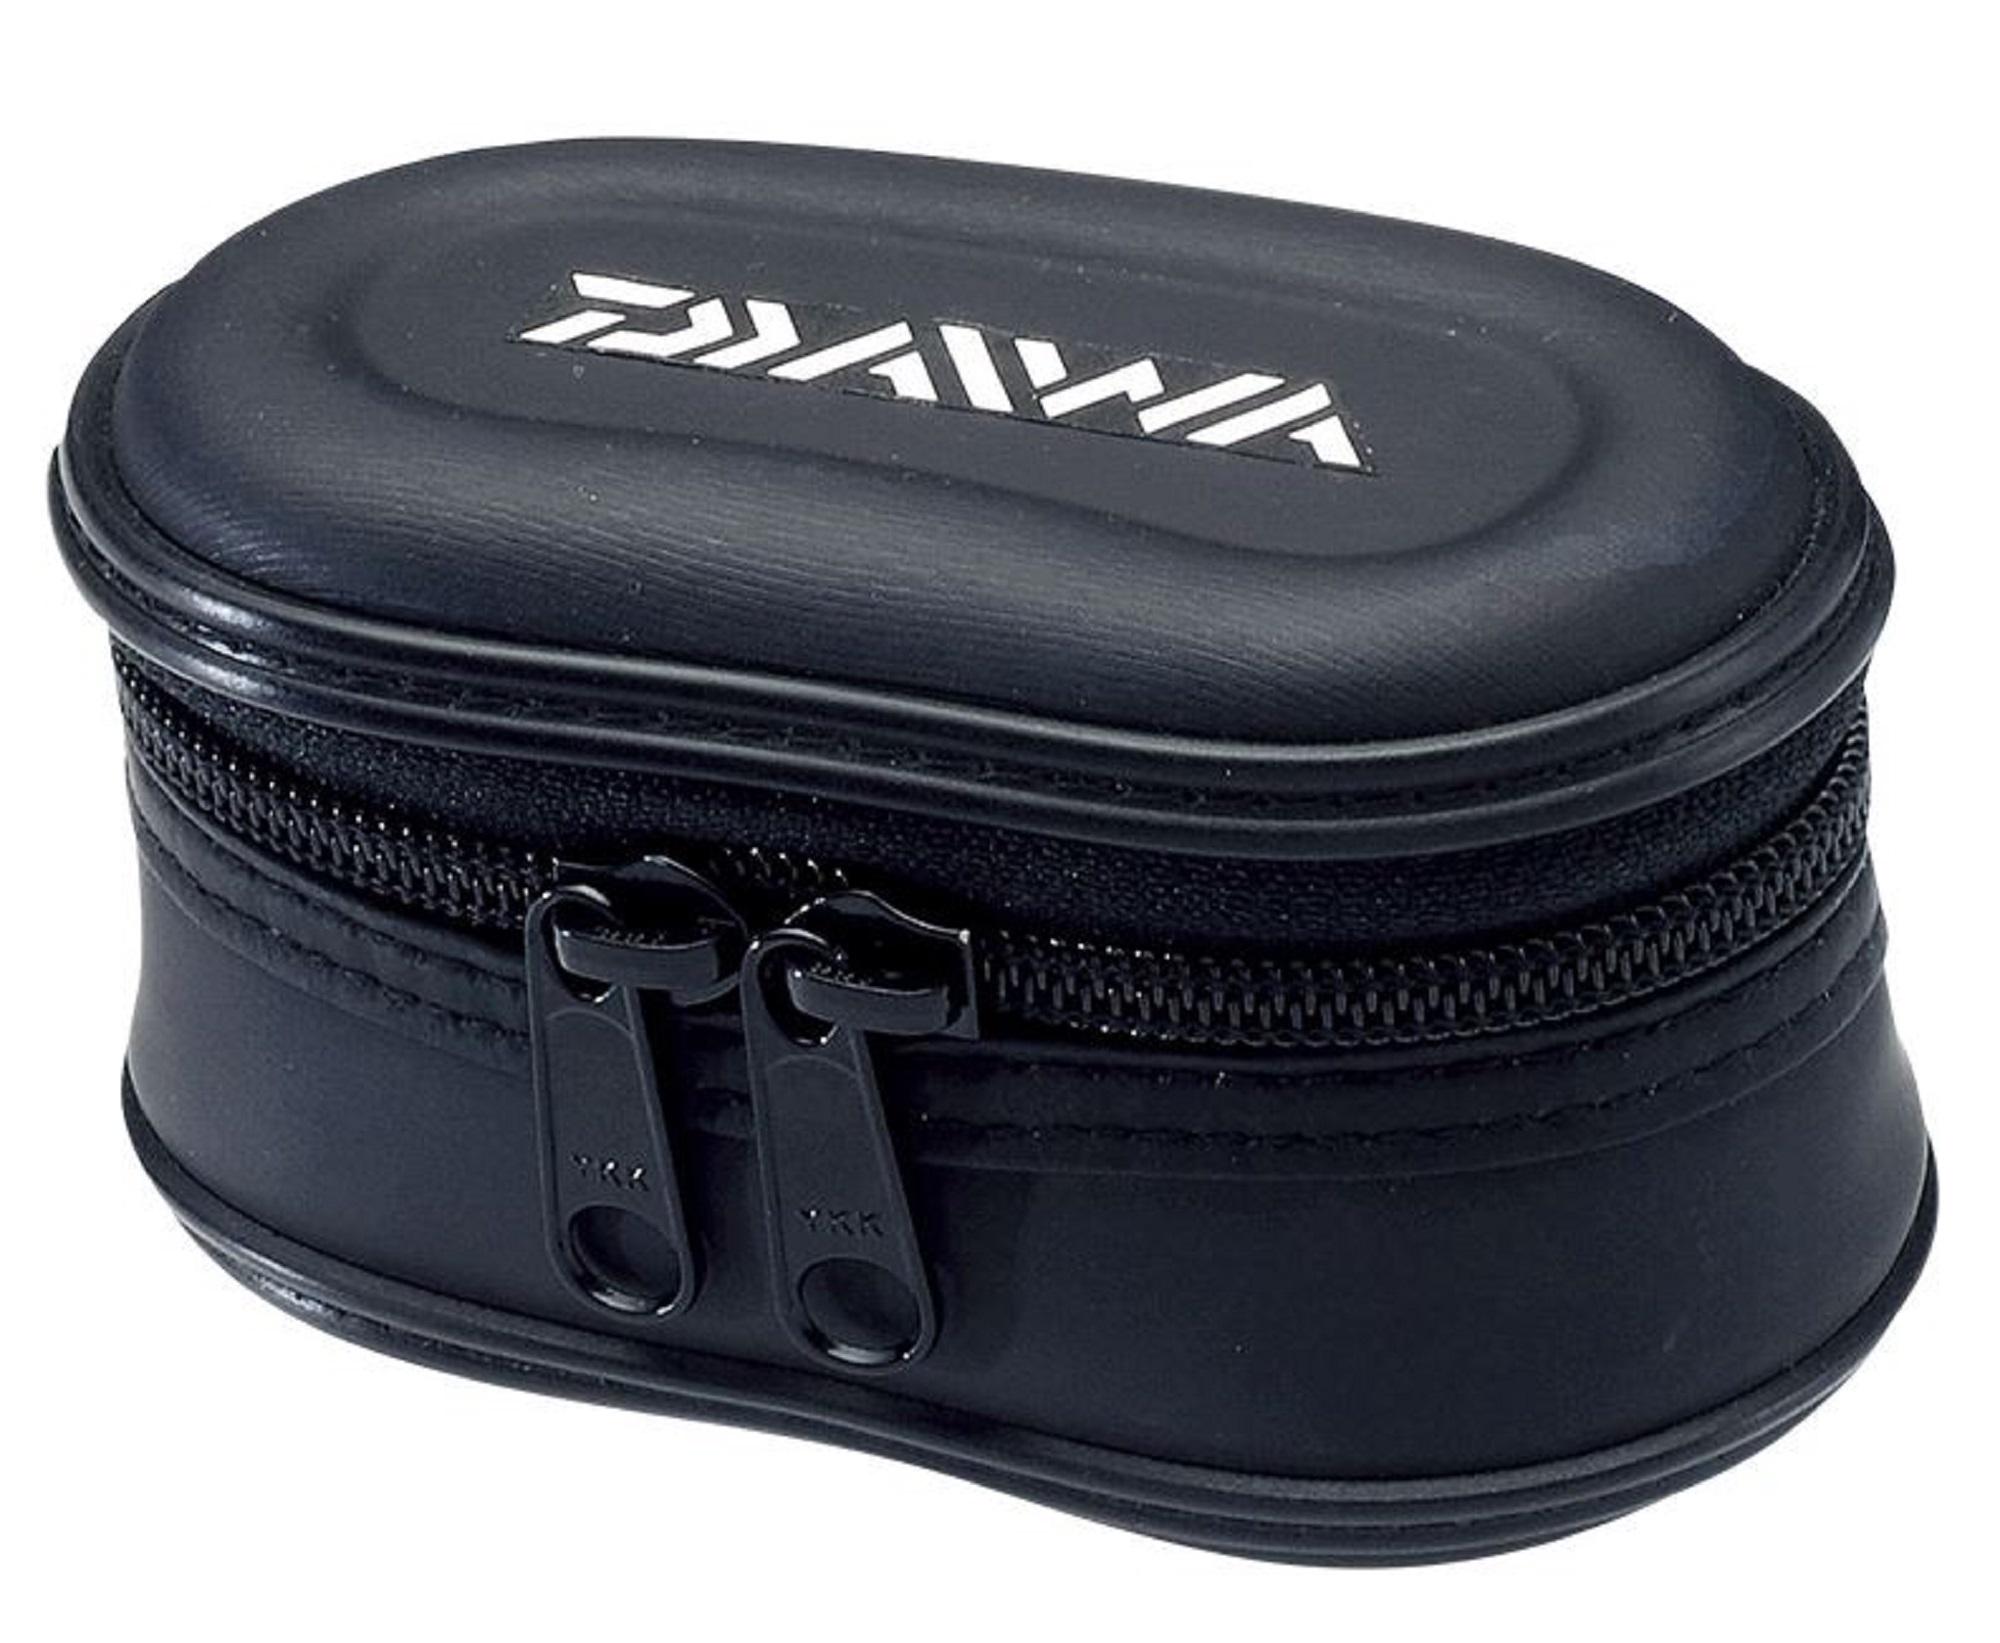 Sale Daiwa SP-S B Spare Spool Case Size S for Size 1500 - 2500 (7153)